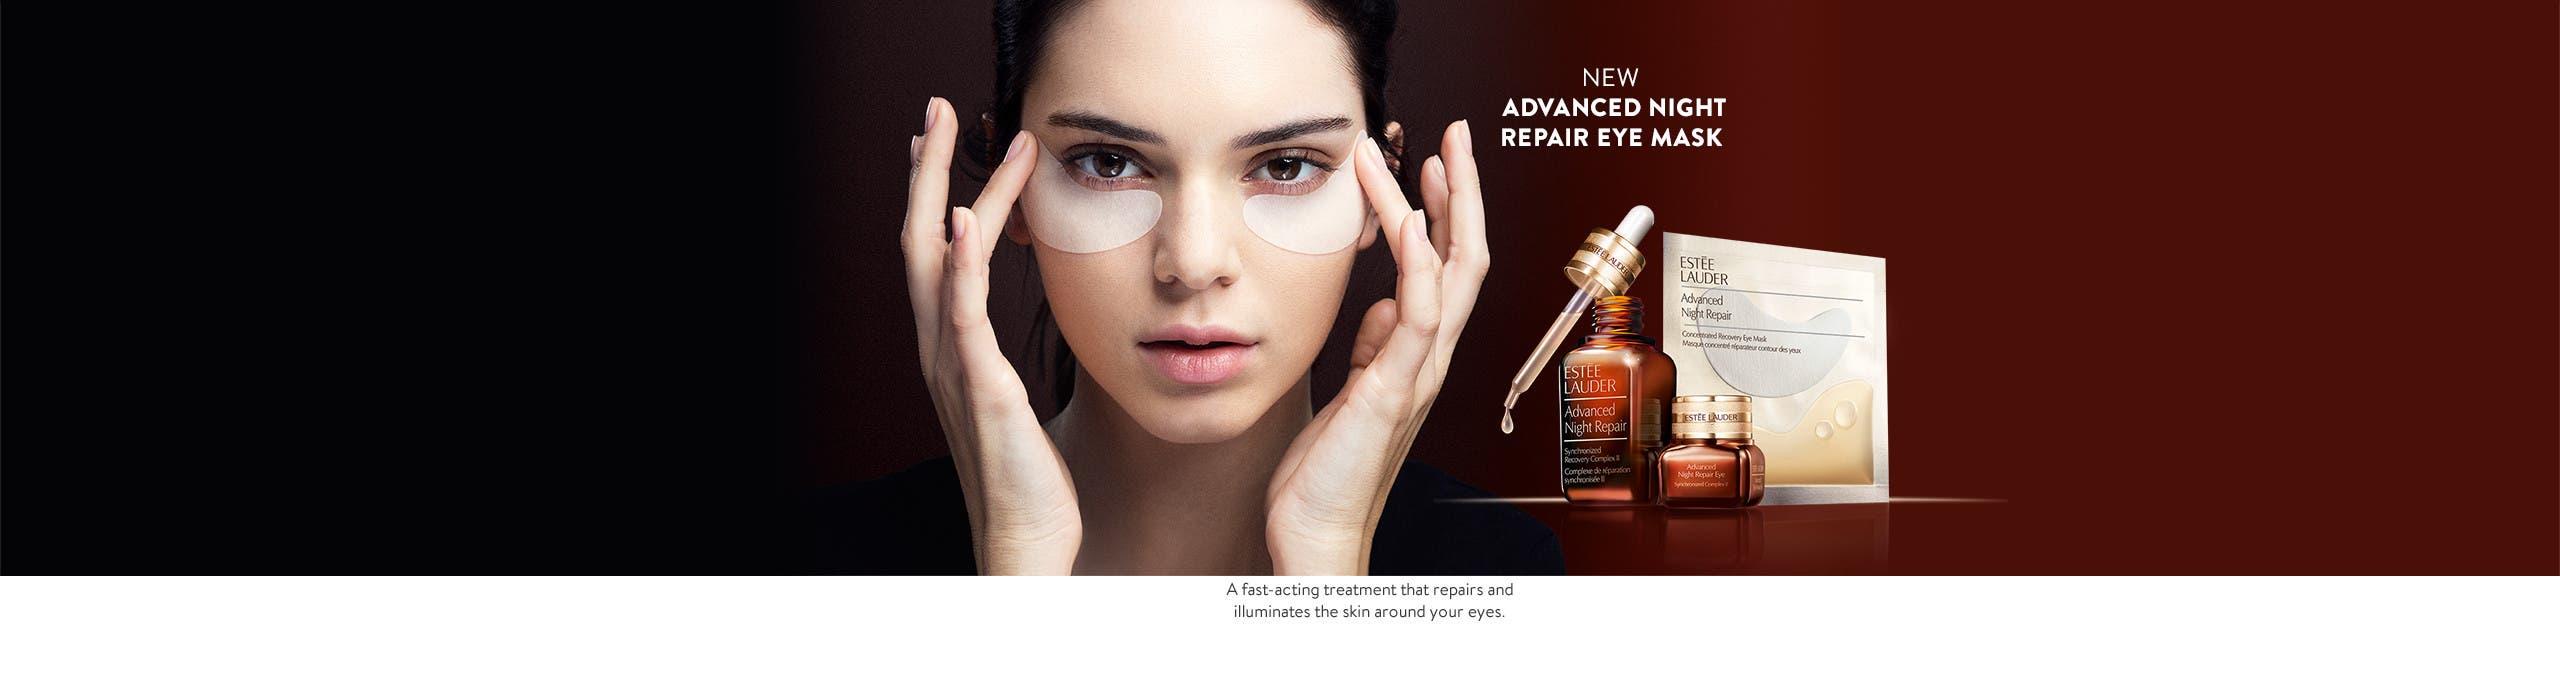 New Advanced Night Repair Eye Mask.